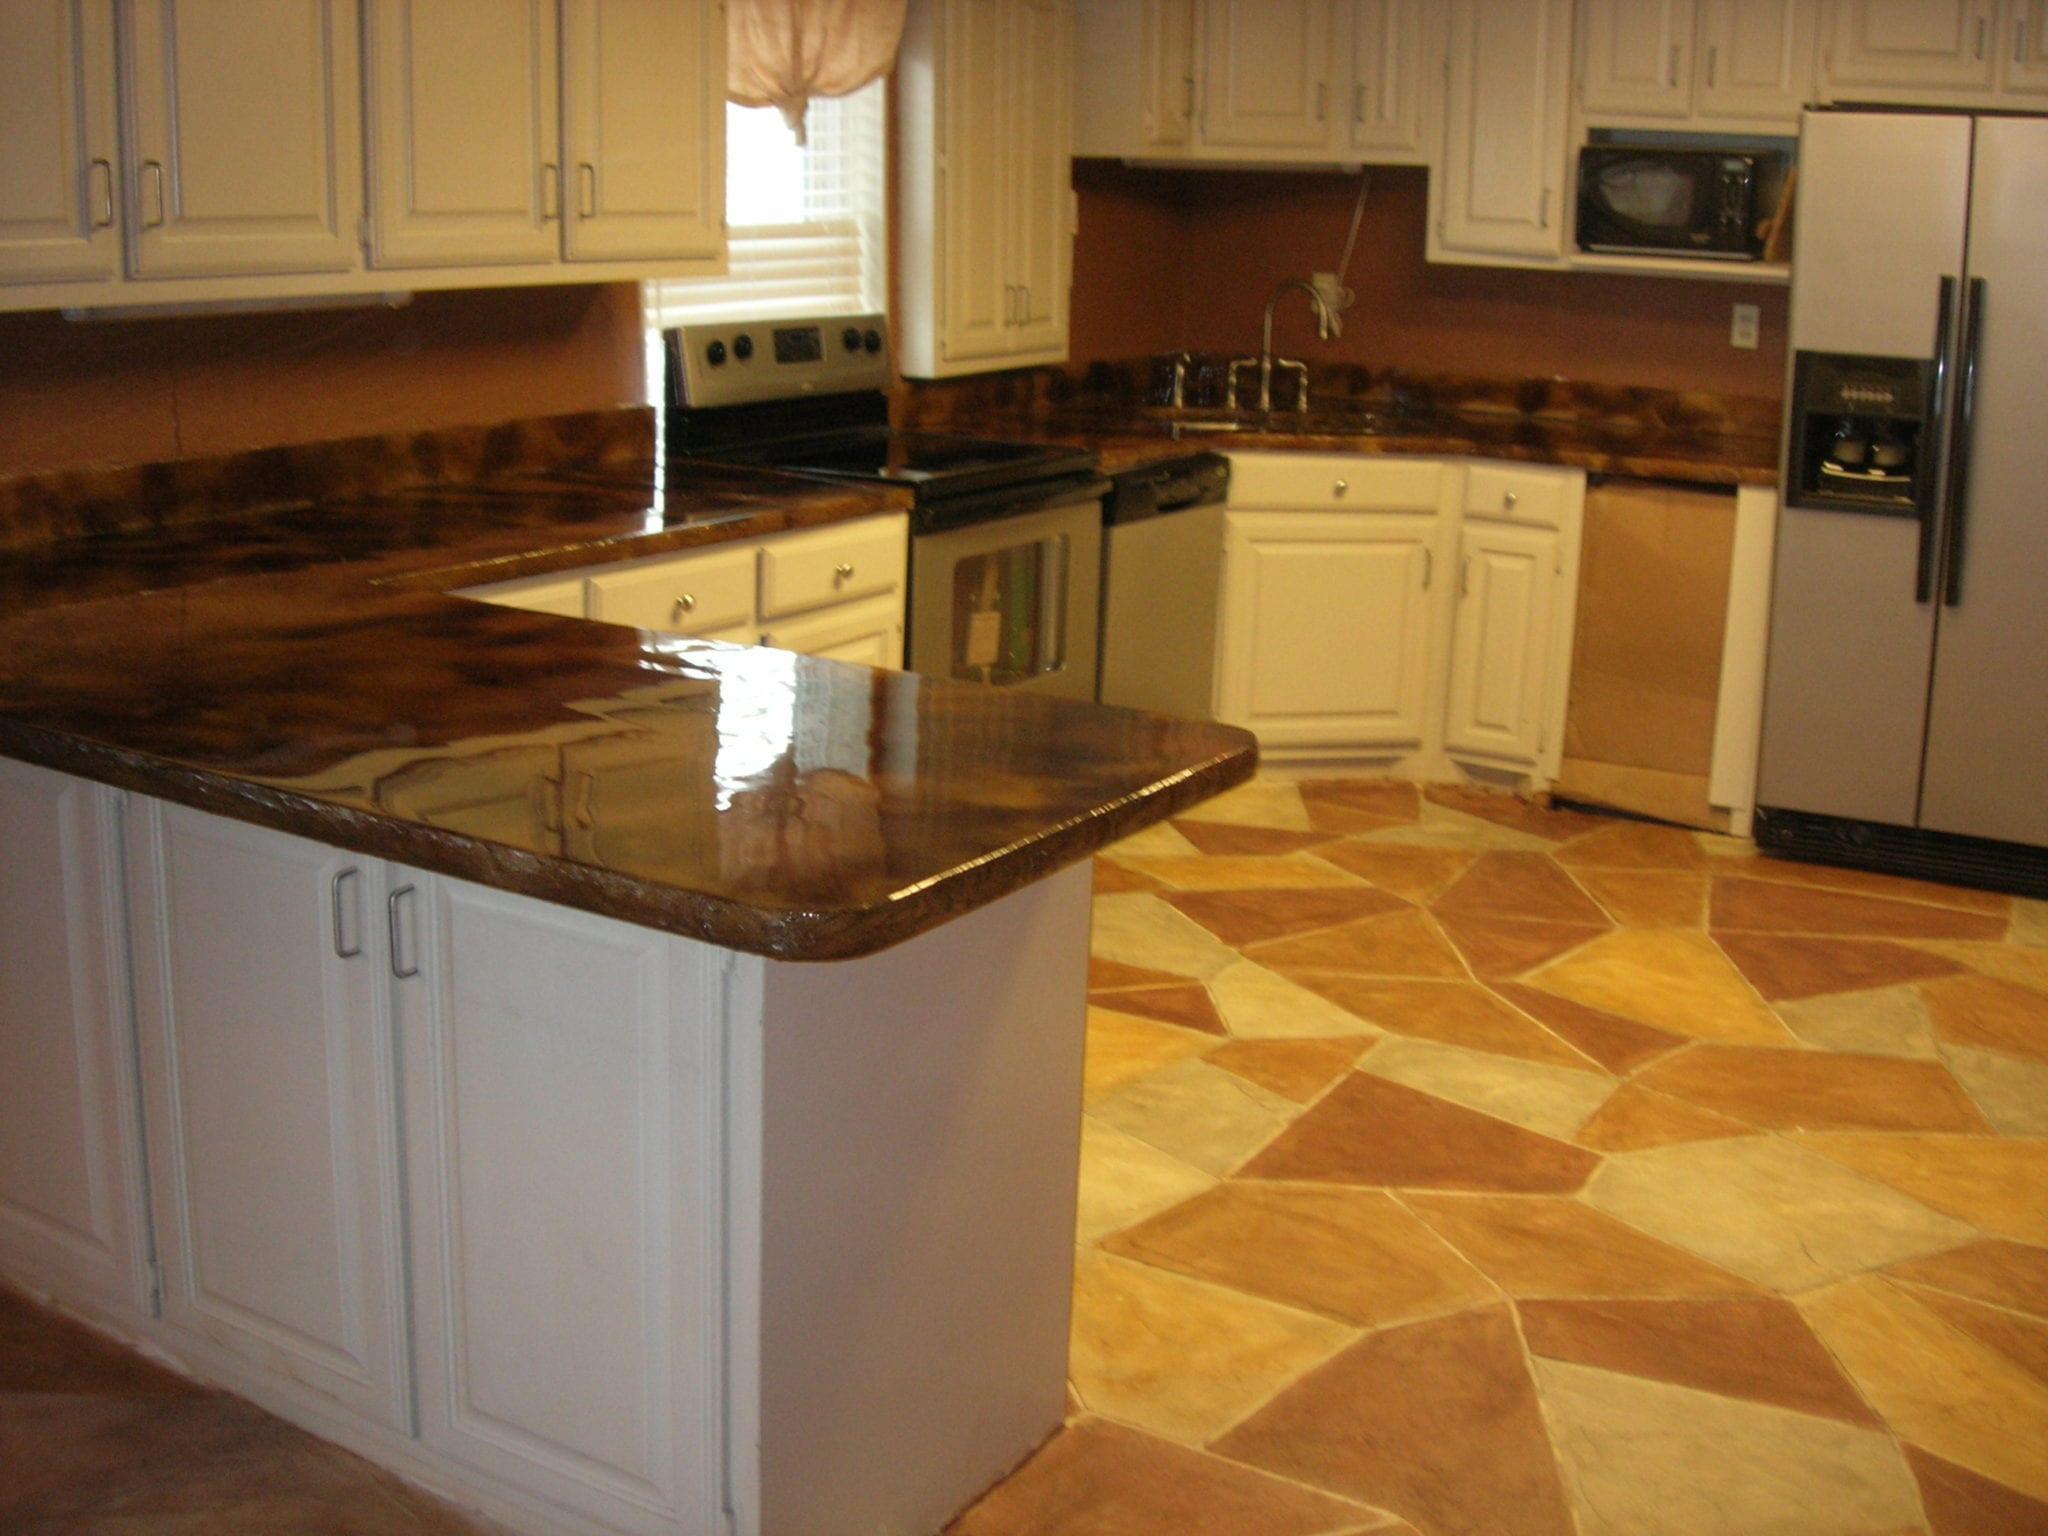 triangular stone floor pattern